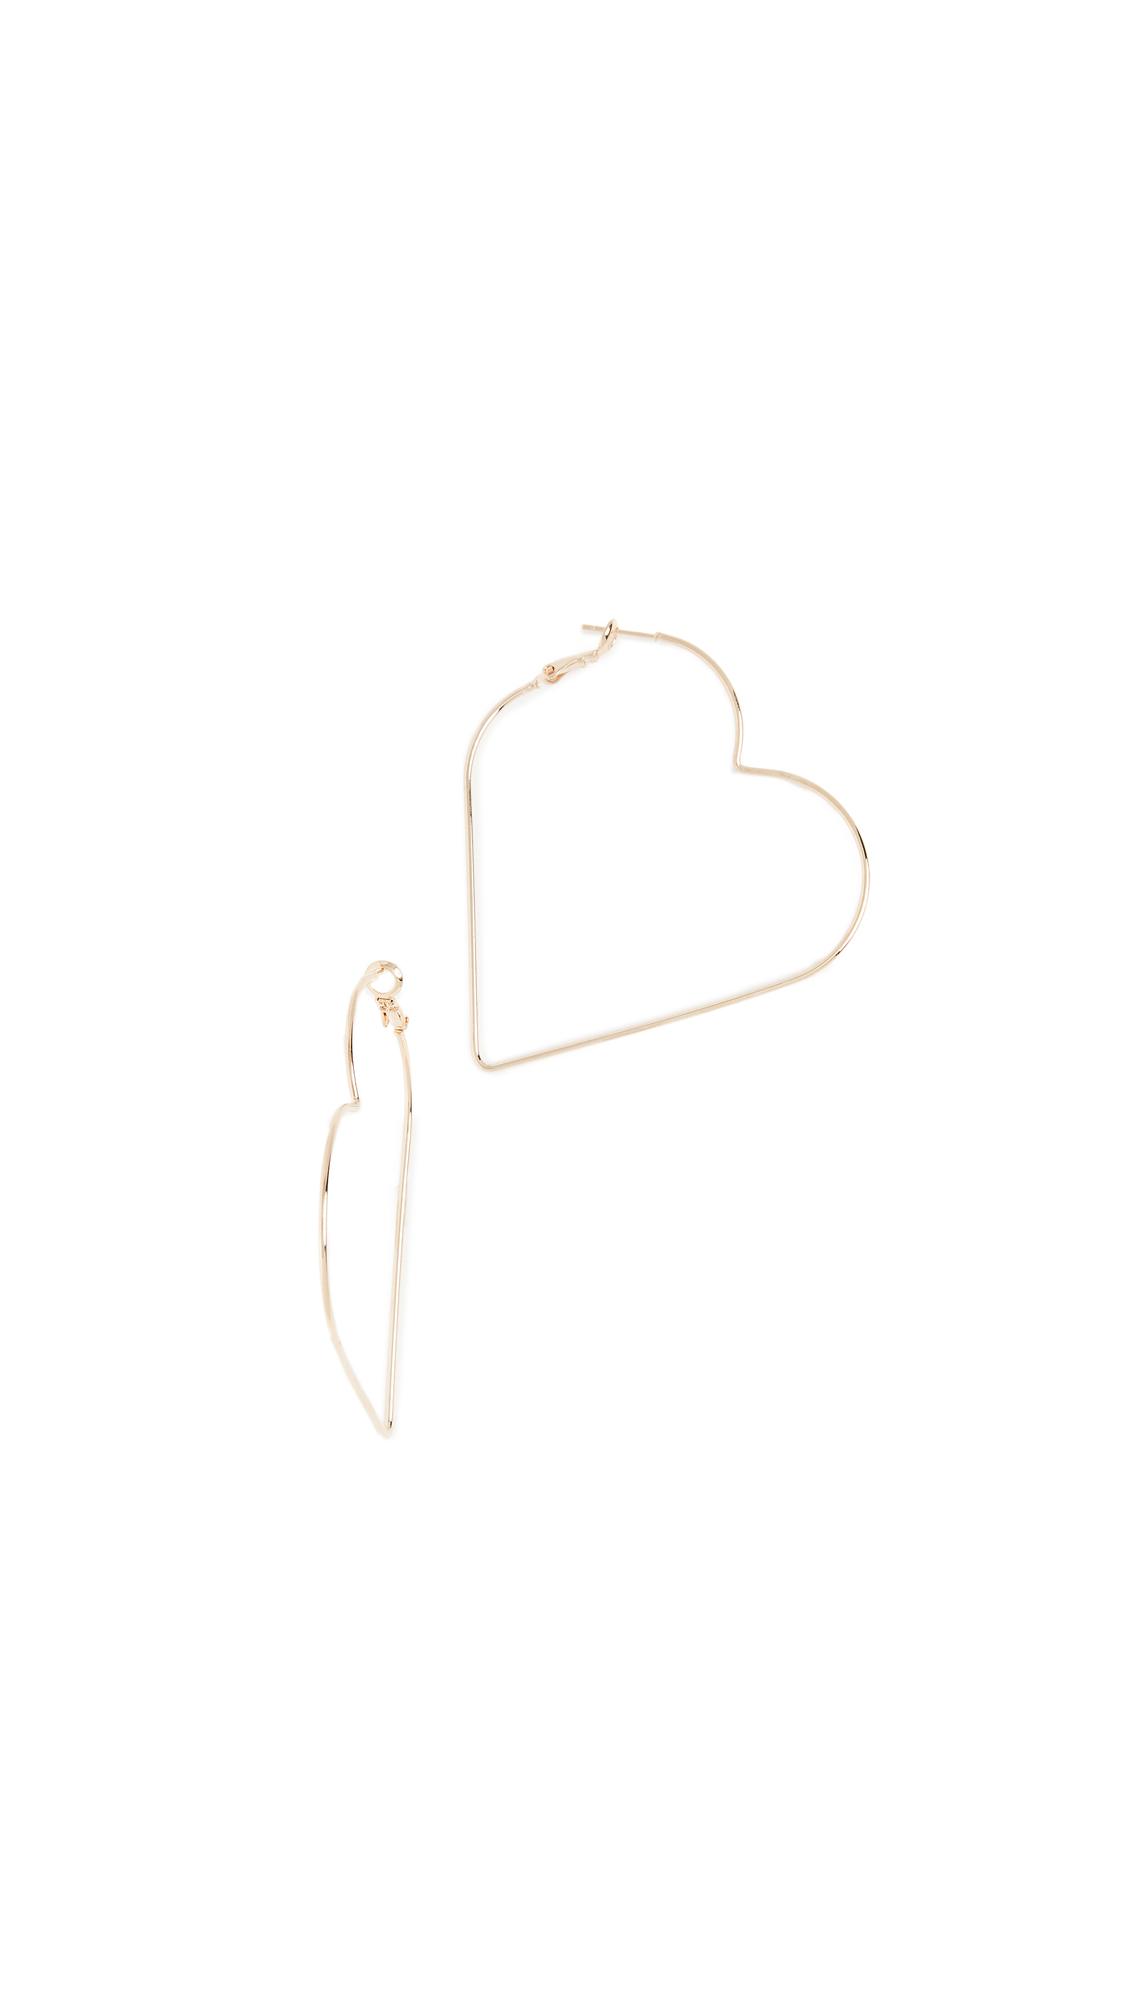 Theia Jewelry Polished Heart Hoop Earring